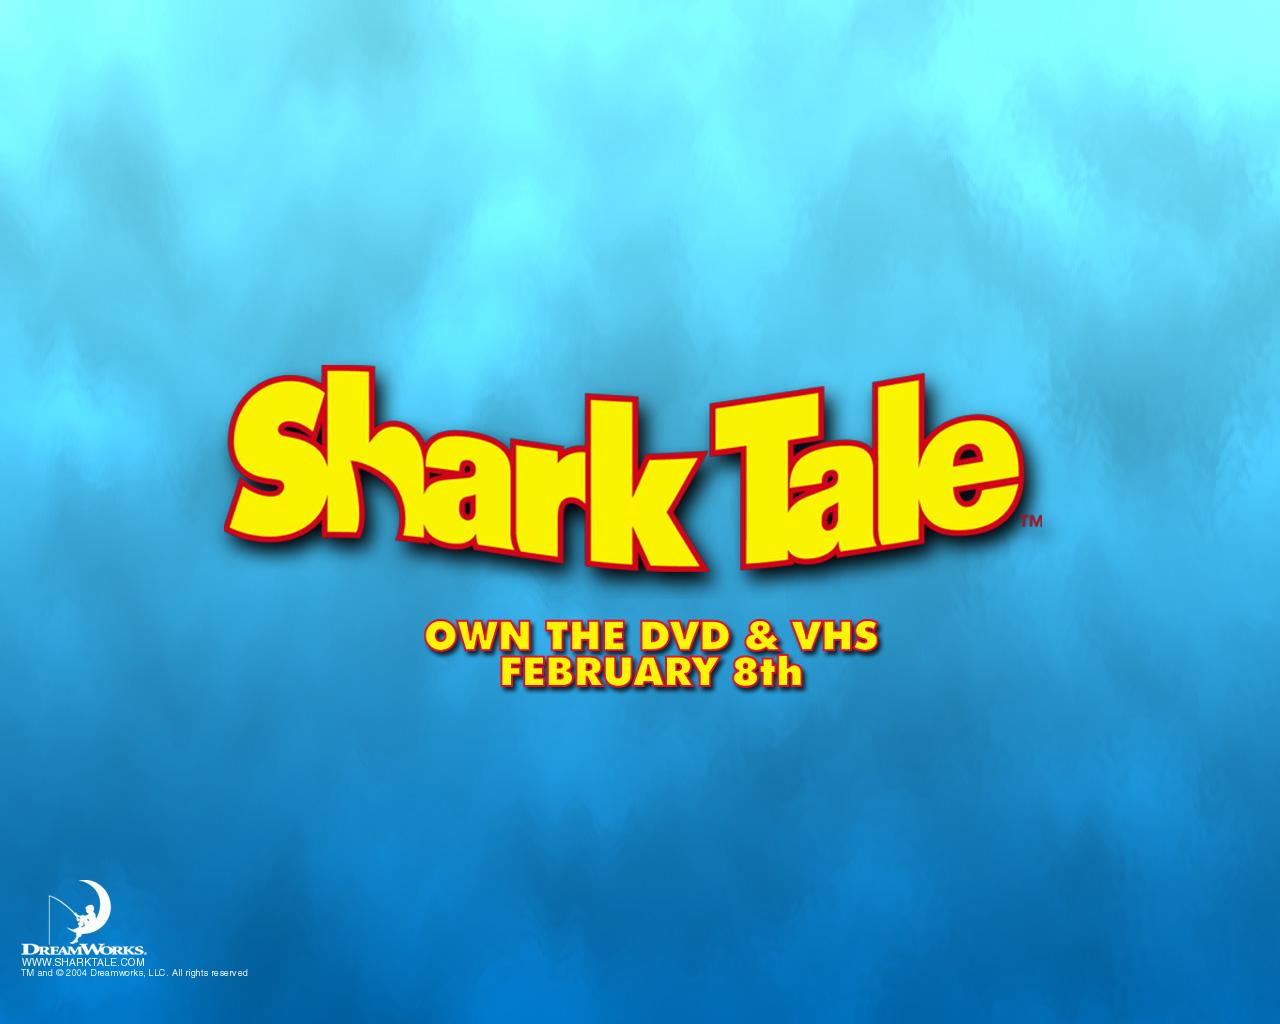 shark_tale_wallpaper_1